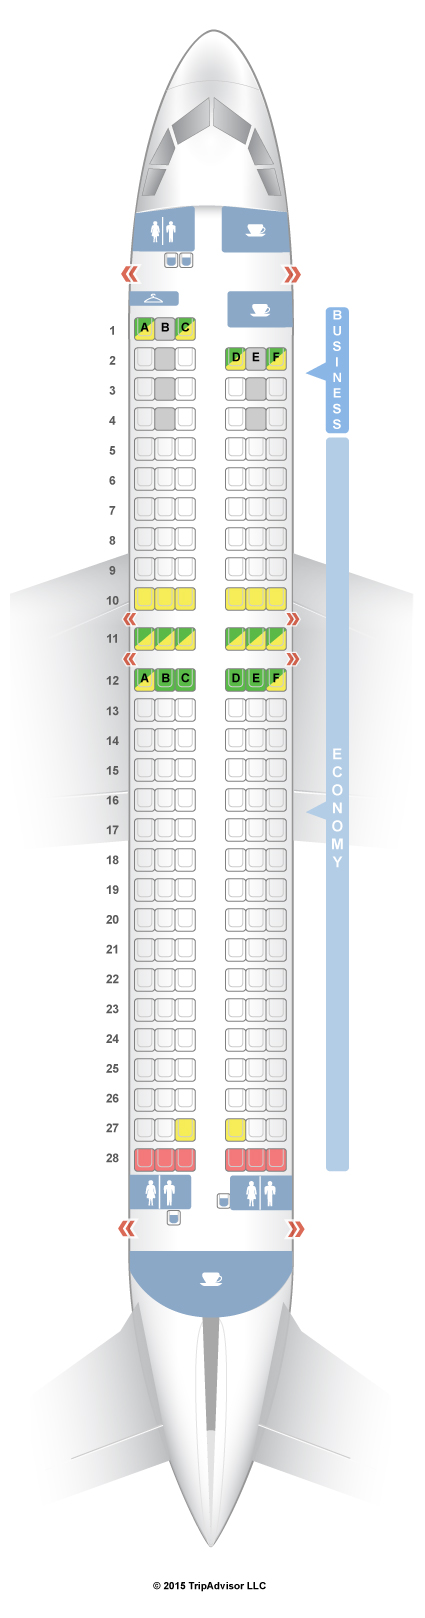 A320 Seat Map SeatGuru Seat Map Finnair